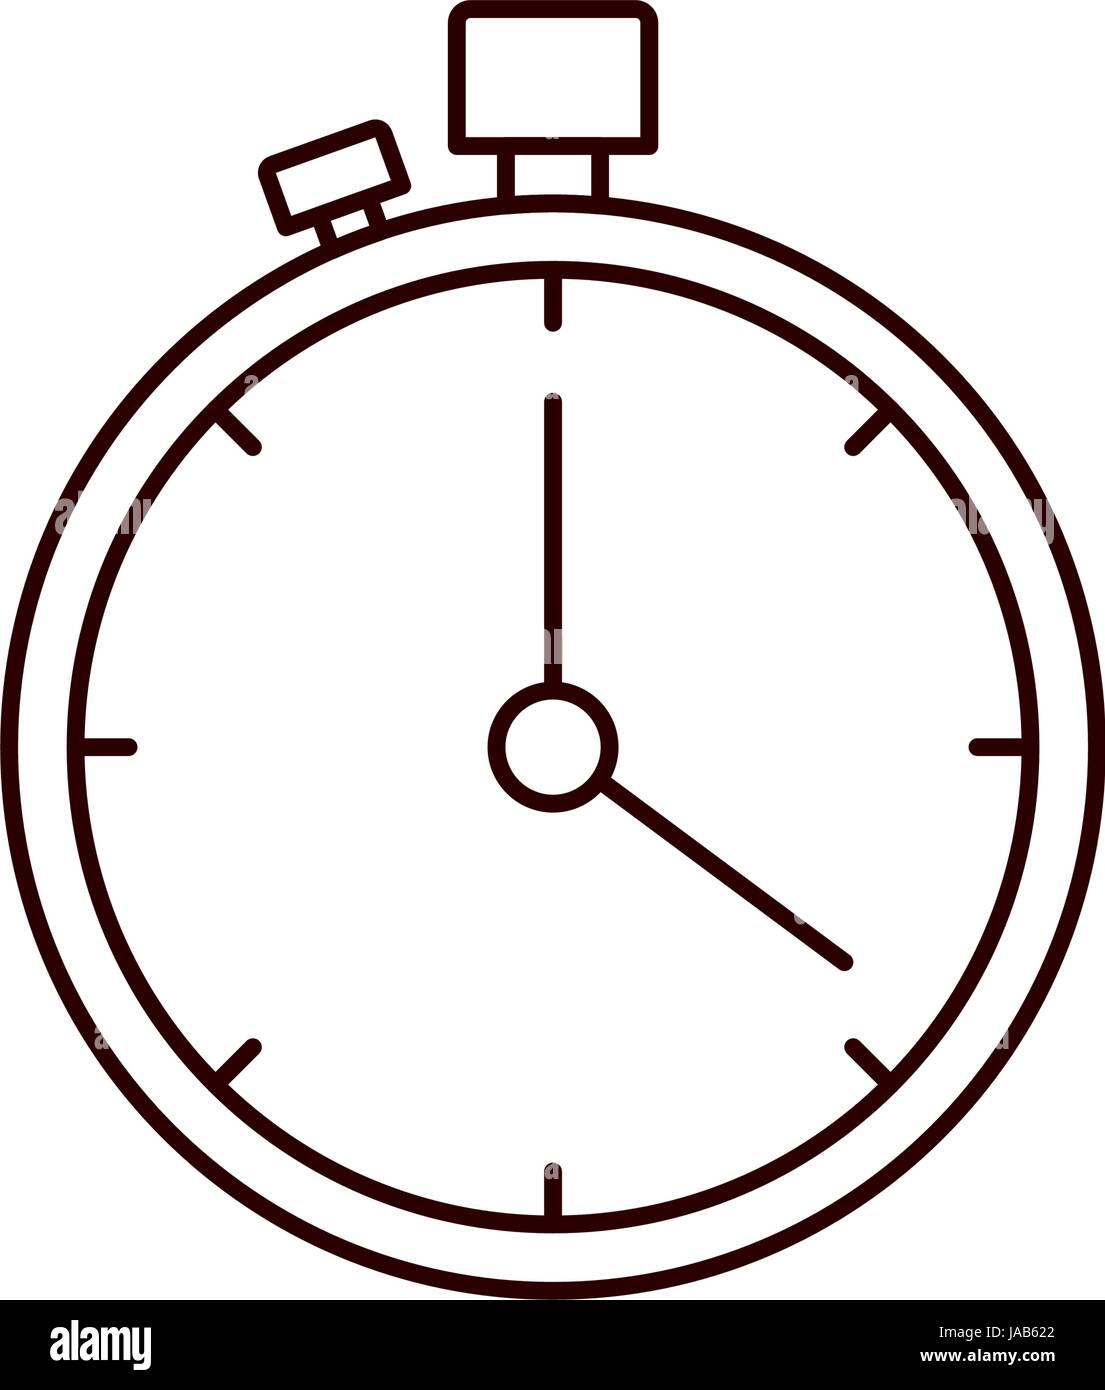 Sketch Clock Numbers Stockfotos & Sketch Clock Numbers Bilder - Alamy